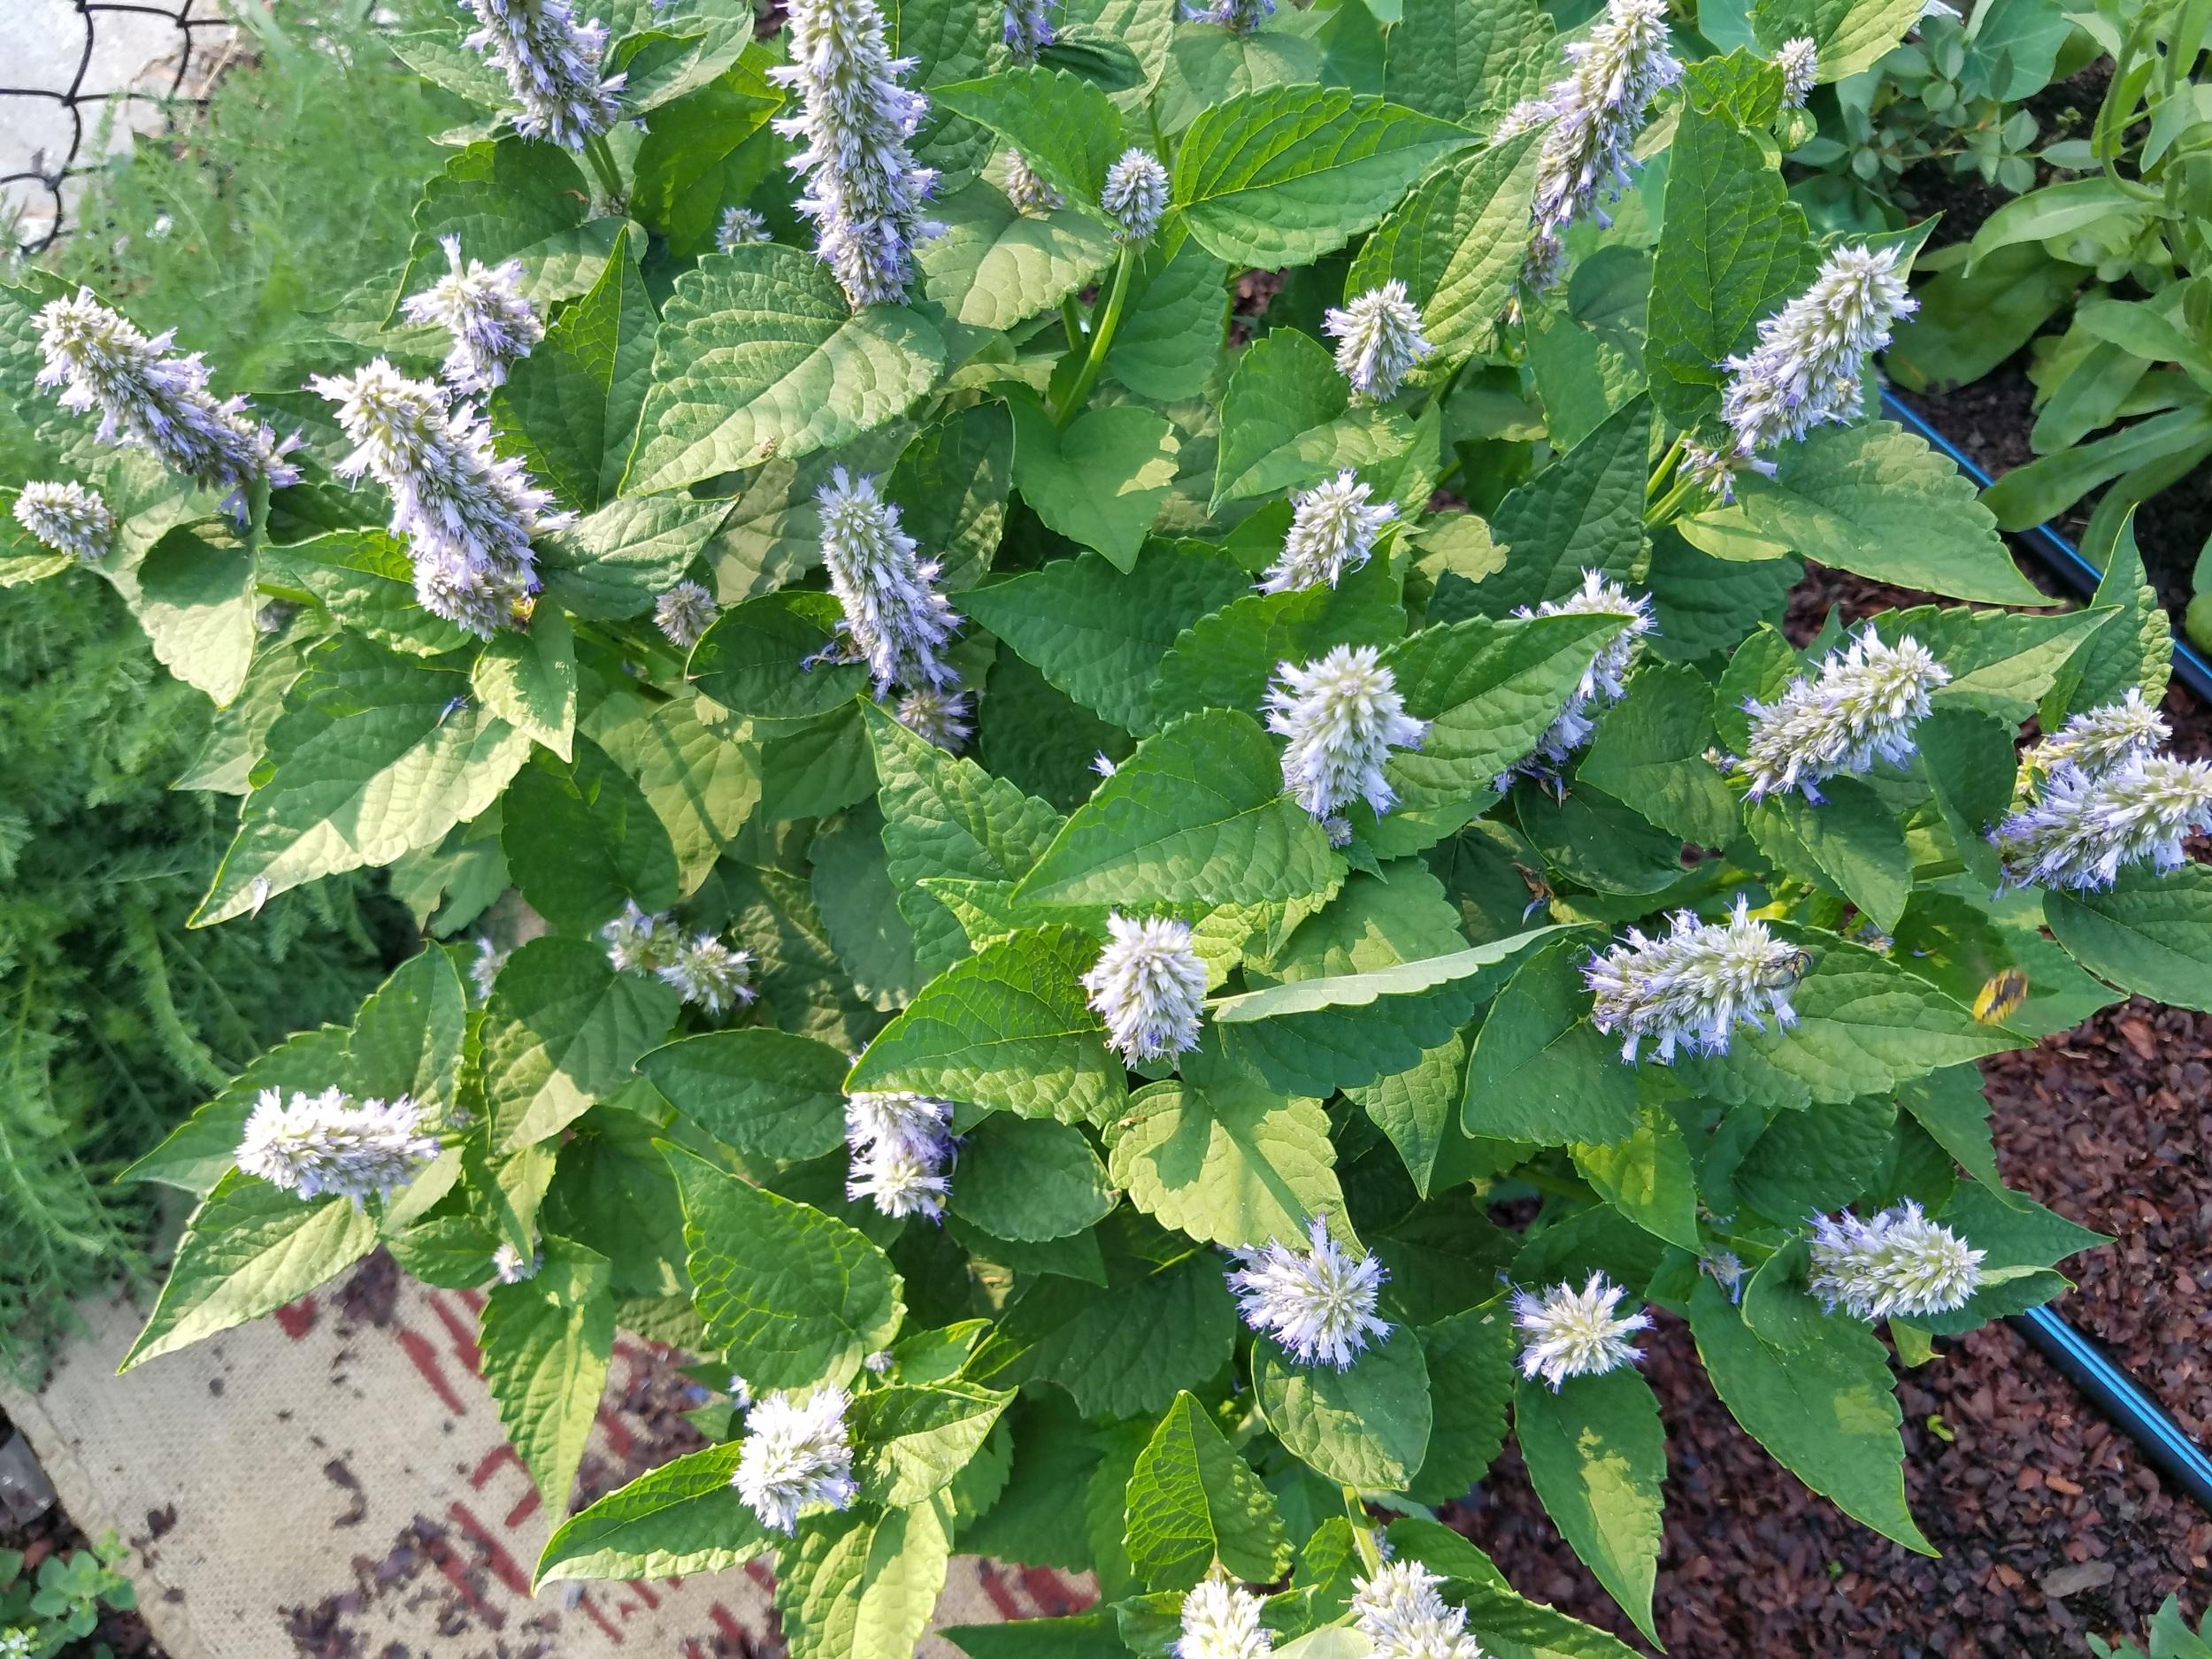 Agastache (Licorice Mint)